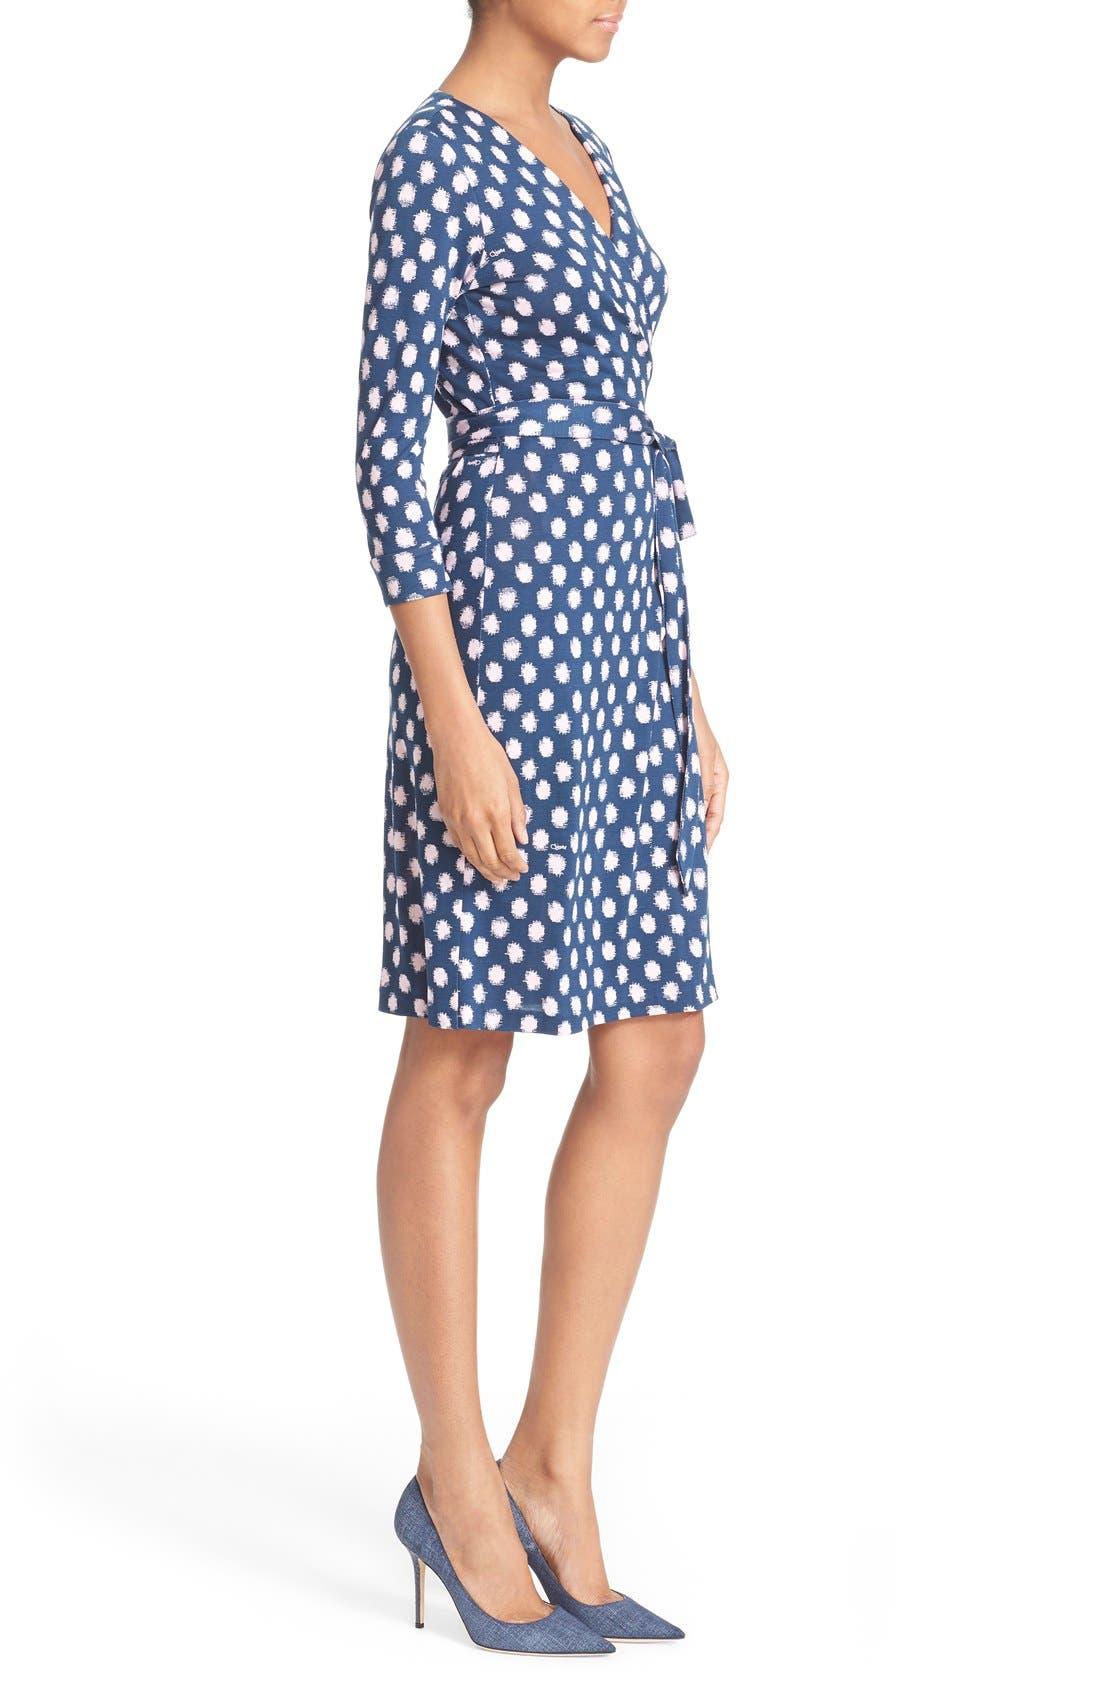 Alternate Image 3  - Diane von Furstenberg 'New Julian Two' Polka Dot Silk Wrap Dress (Nordstrom Exclusive)